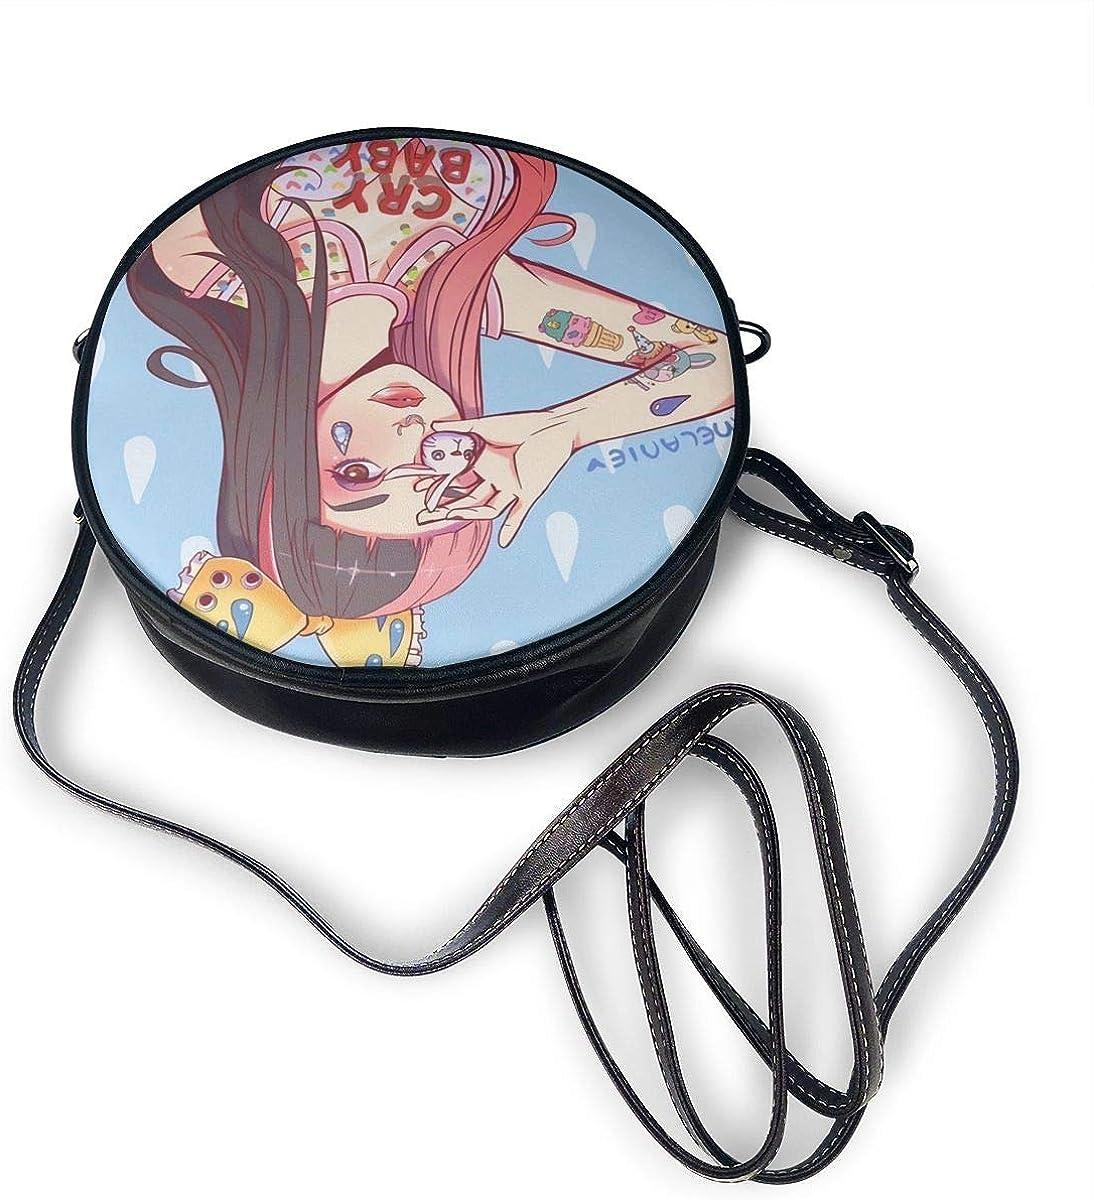 7.1x7.1x2.36 inch Melanie Martinez Unique Fashion Leather Round Shoulder Bag Size